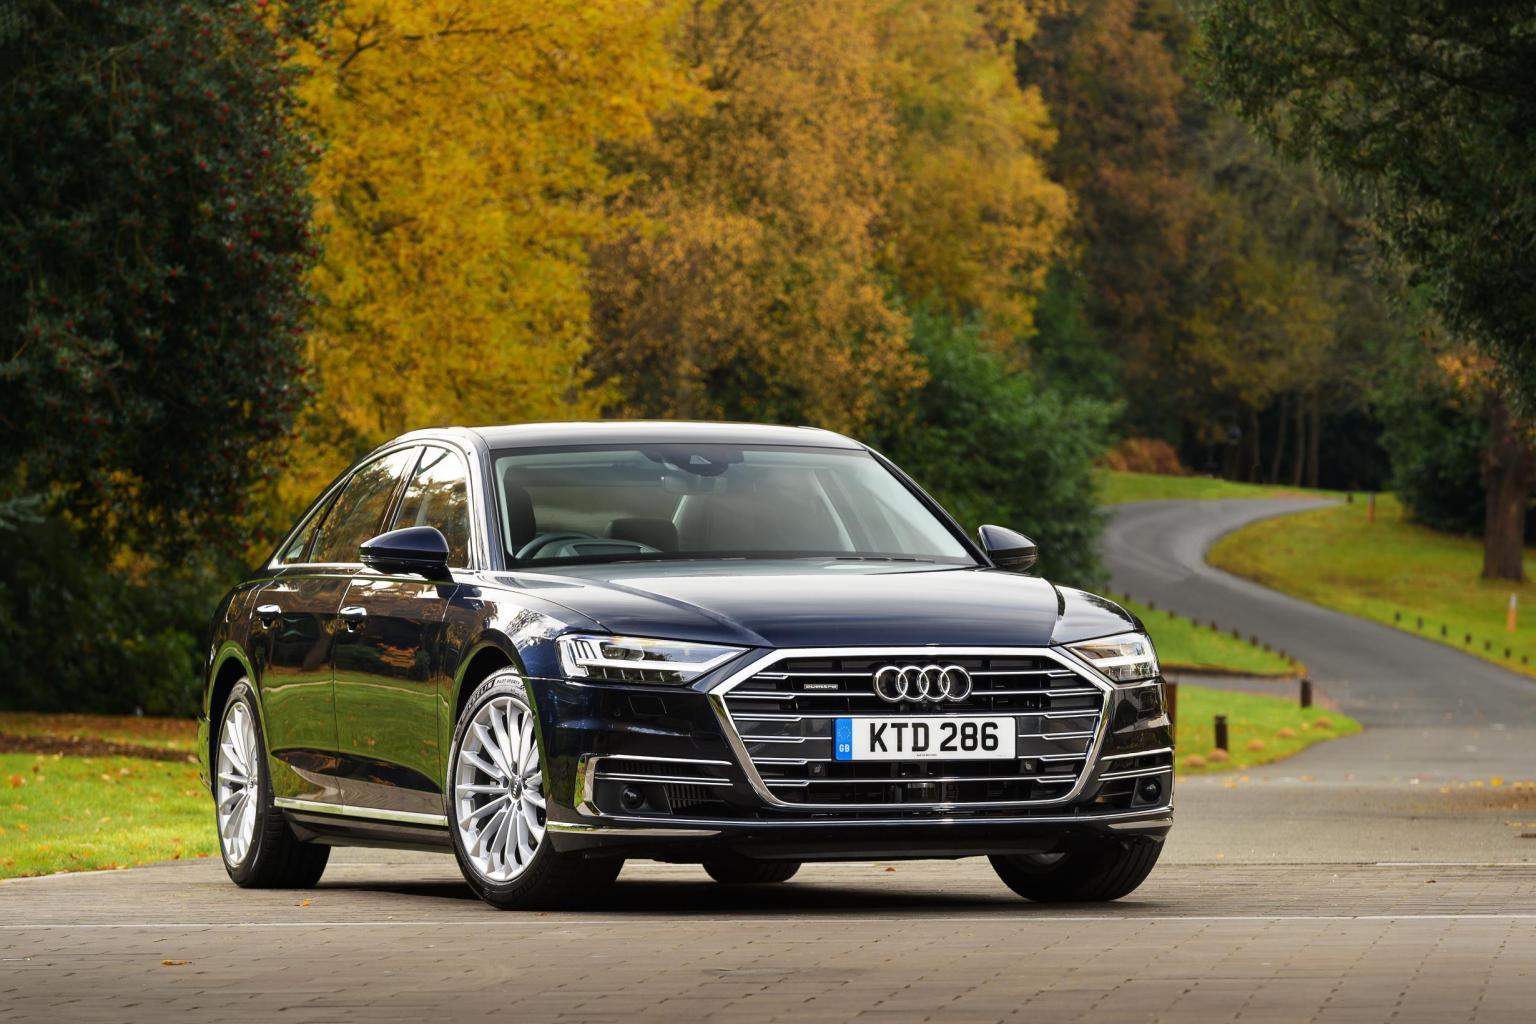 Audi's A8